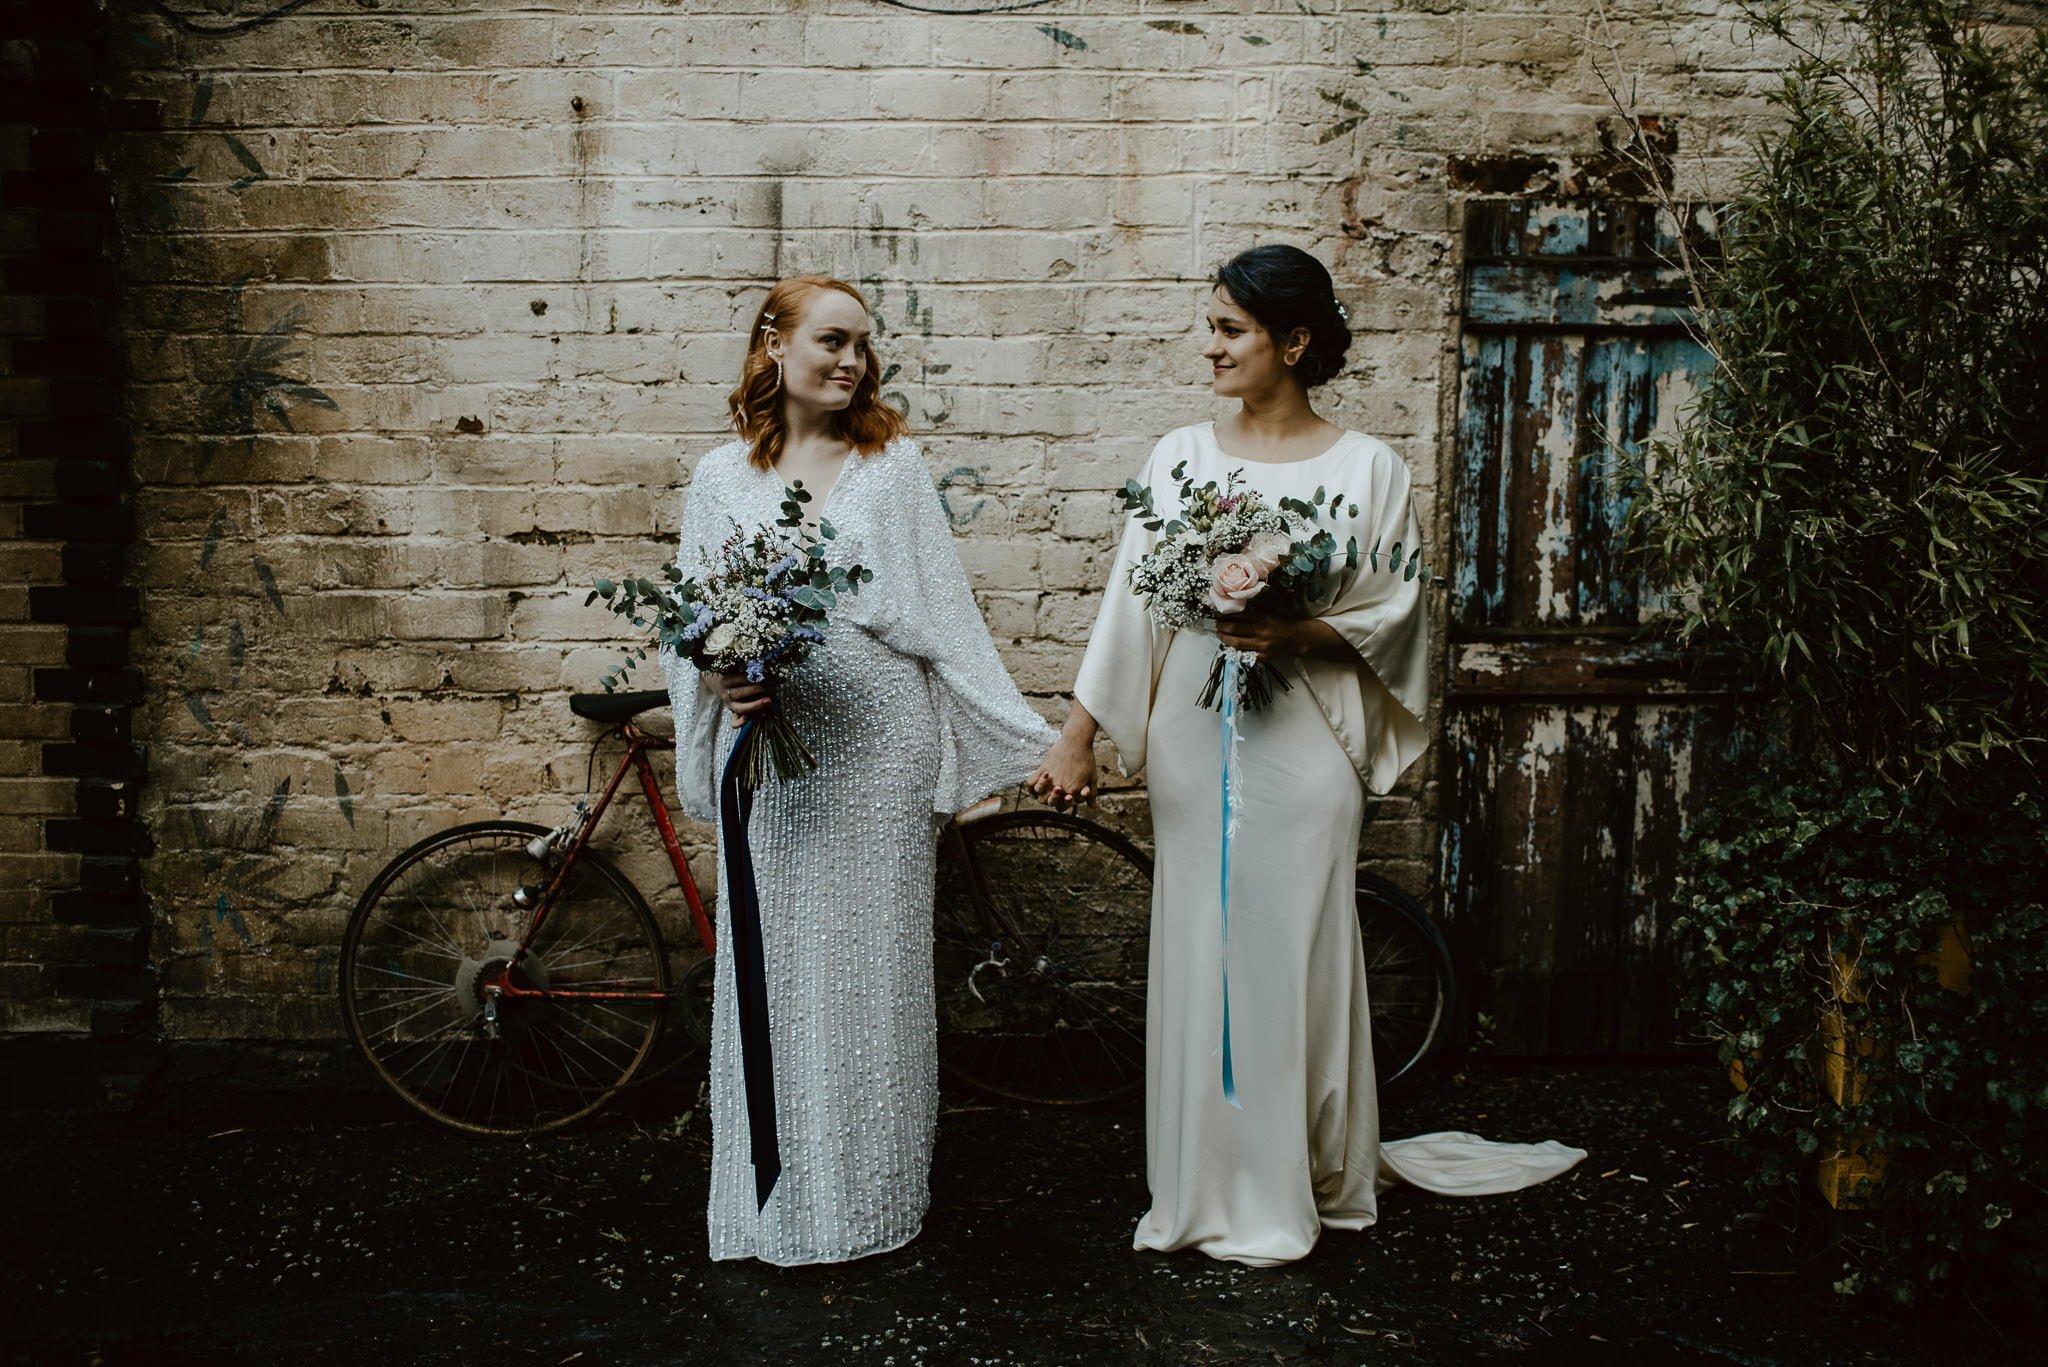 A Dreamy Pre-Raphaelite Wedding at the Bothy in Glasgow 15